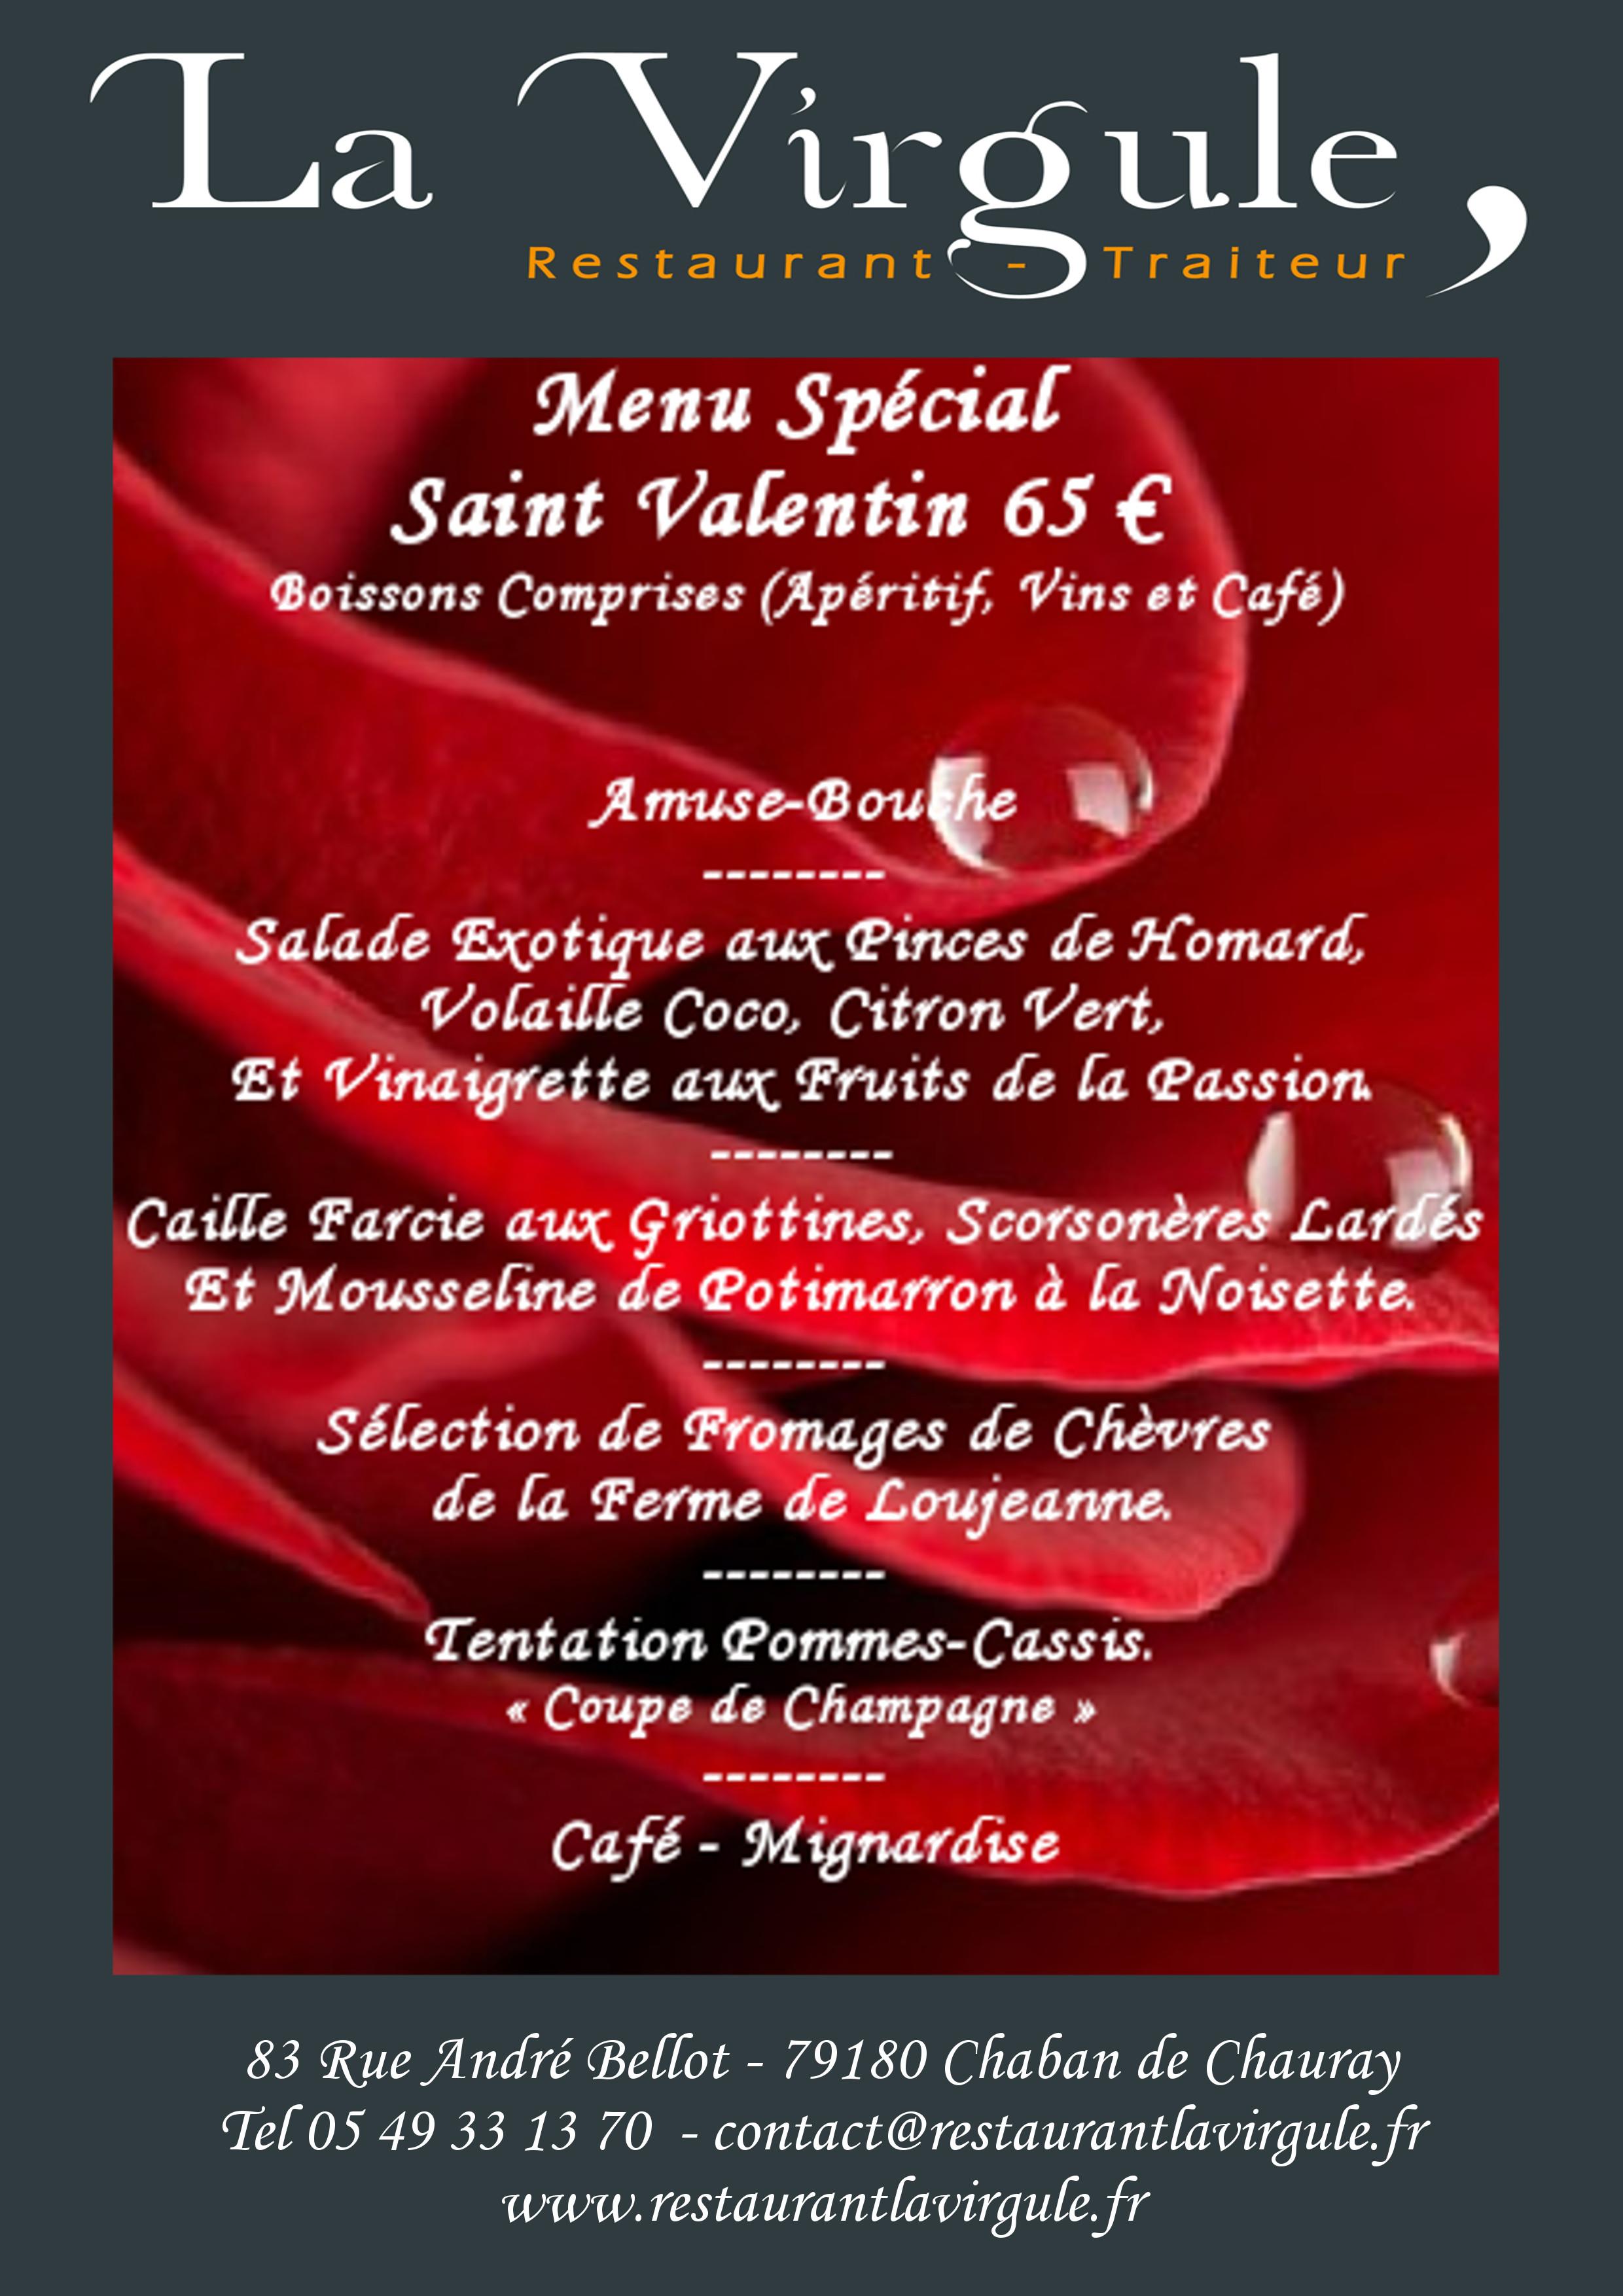 Saint valentin 2017 restaurant la virgule - La saint valentin 2017 ...